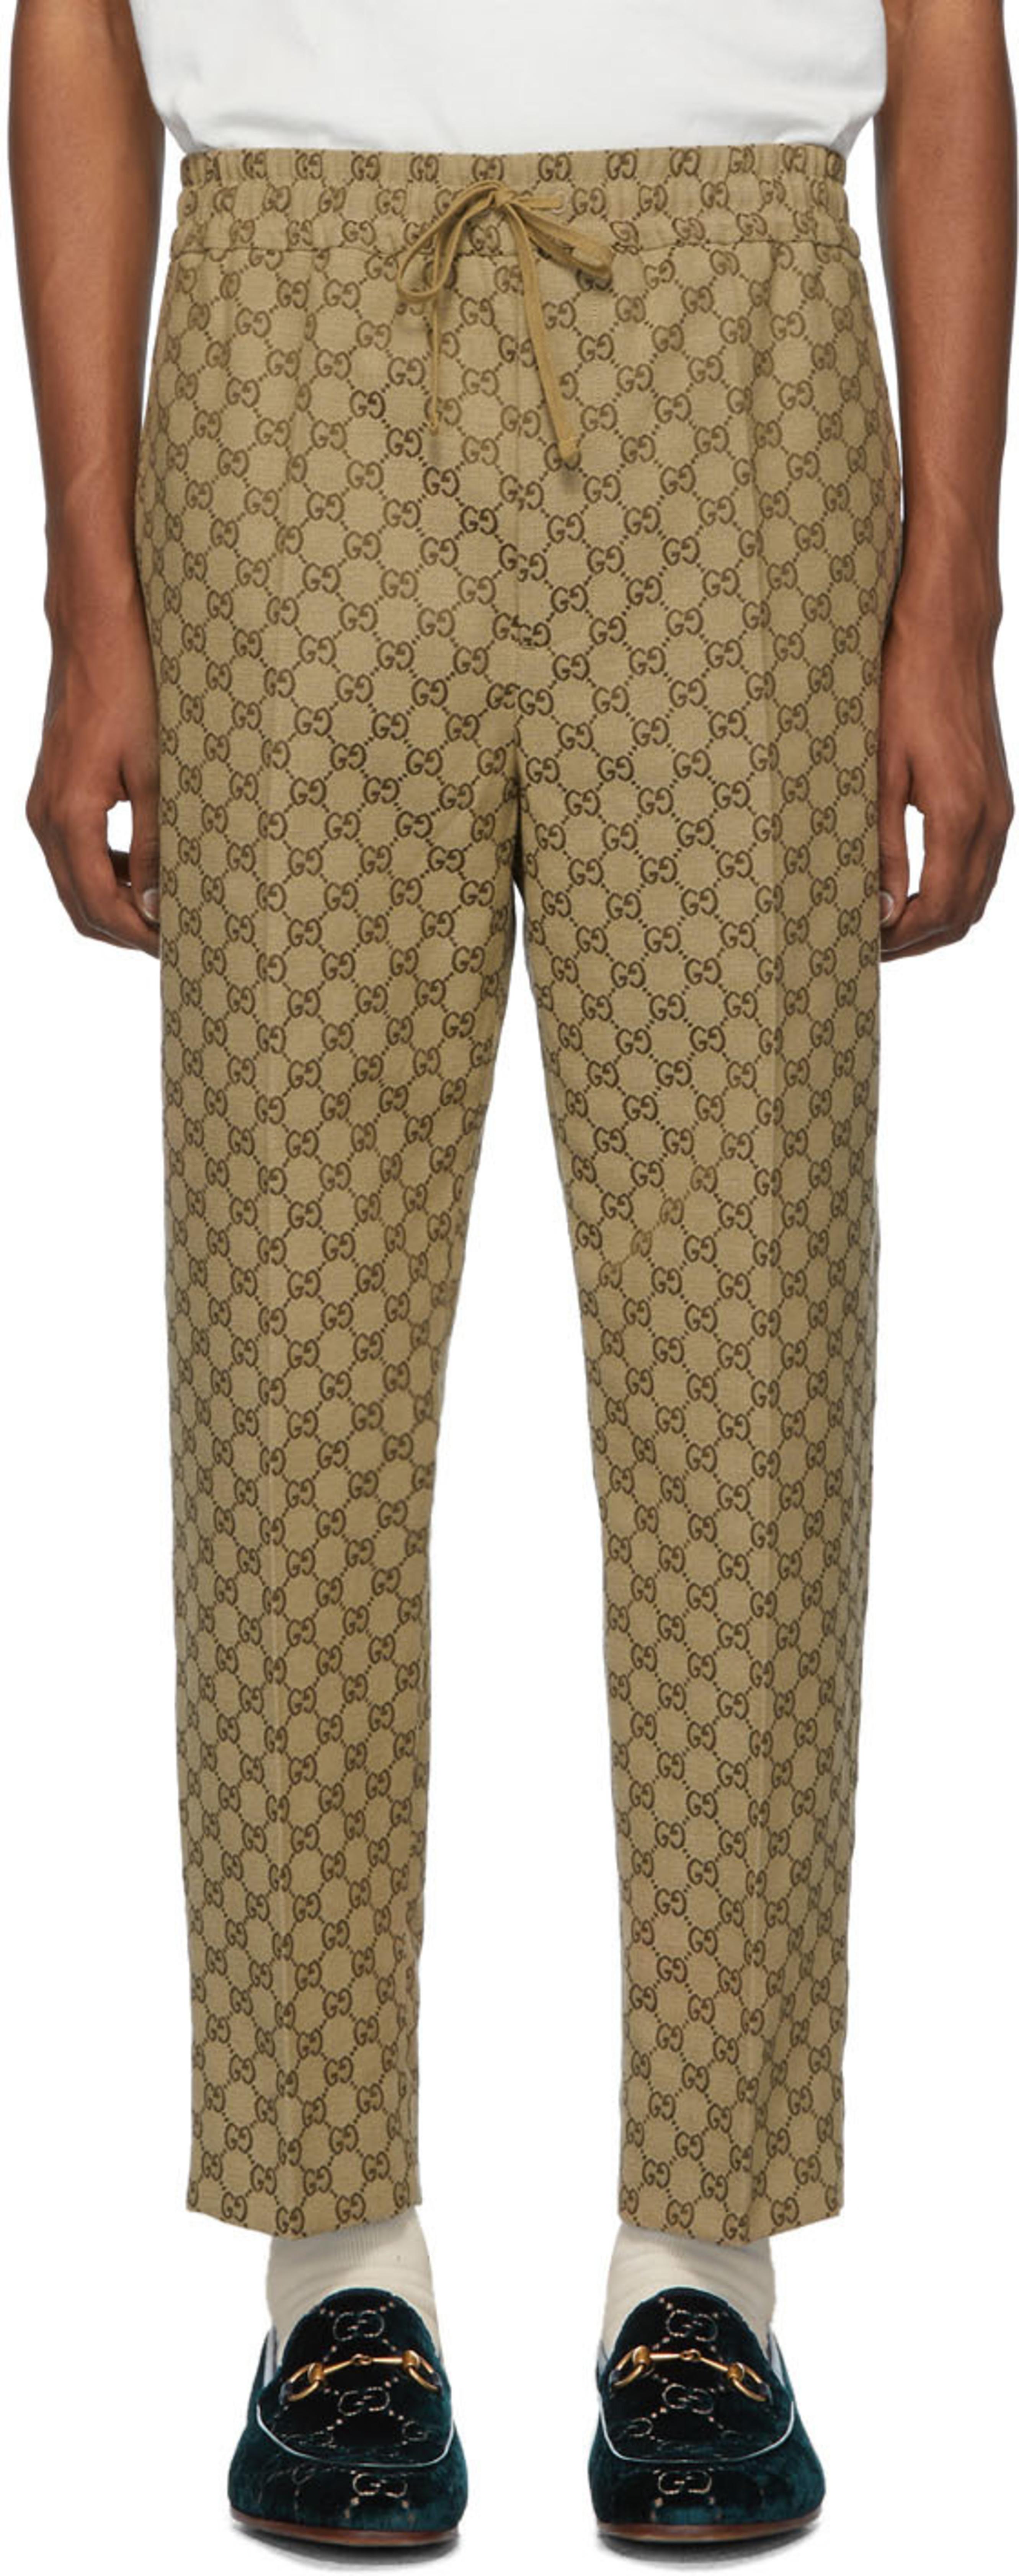 Sportswear Sports et Loisirs Puma Pantalon Active Short Interlock 8